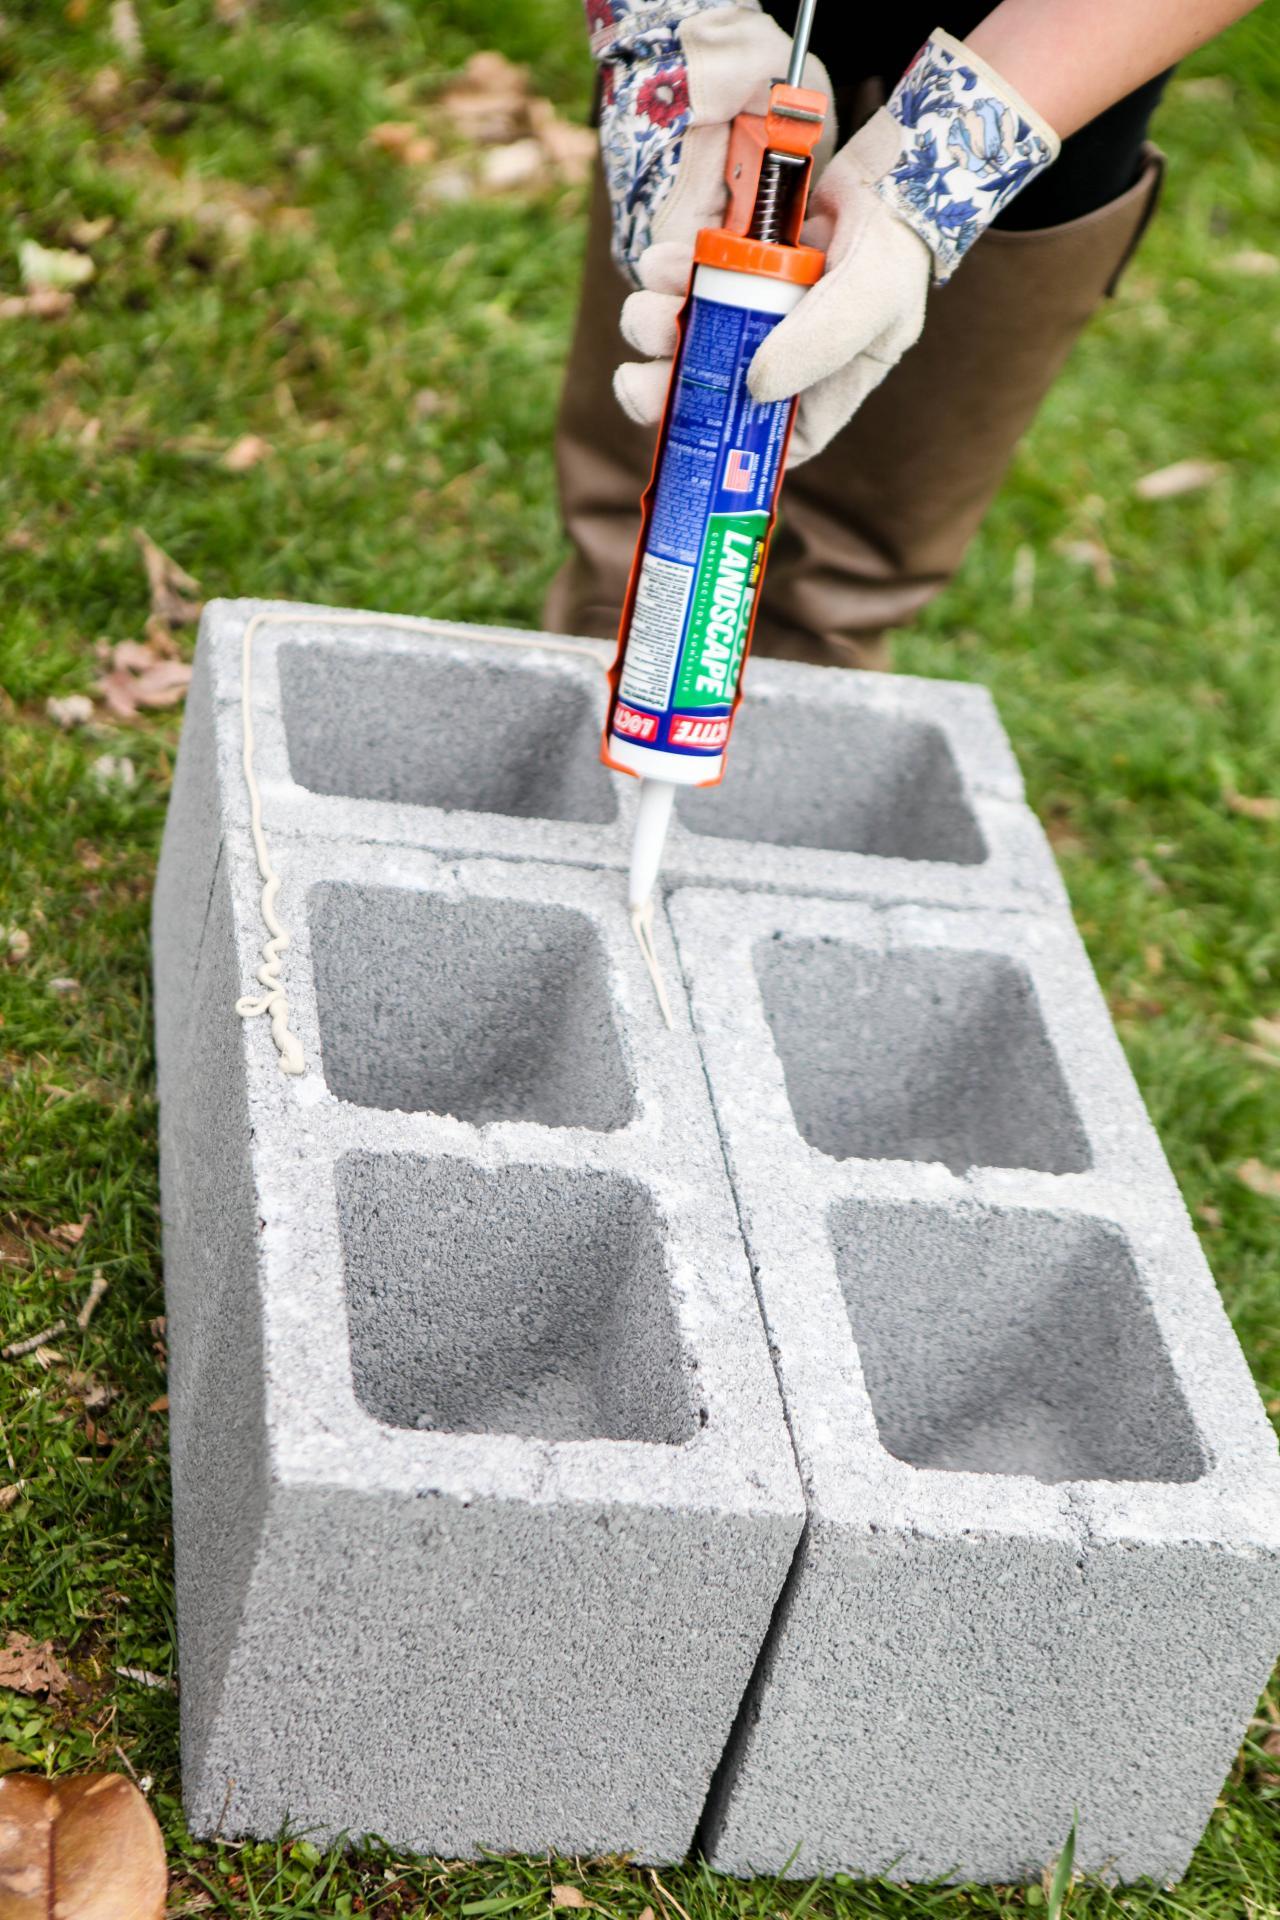 How to Make a Cinderblock Bar and Planter | HGTV's ...